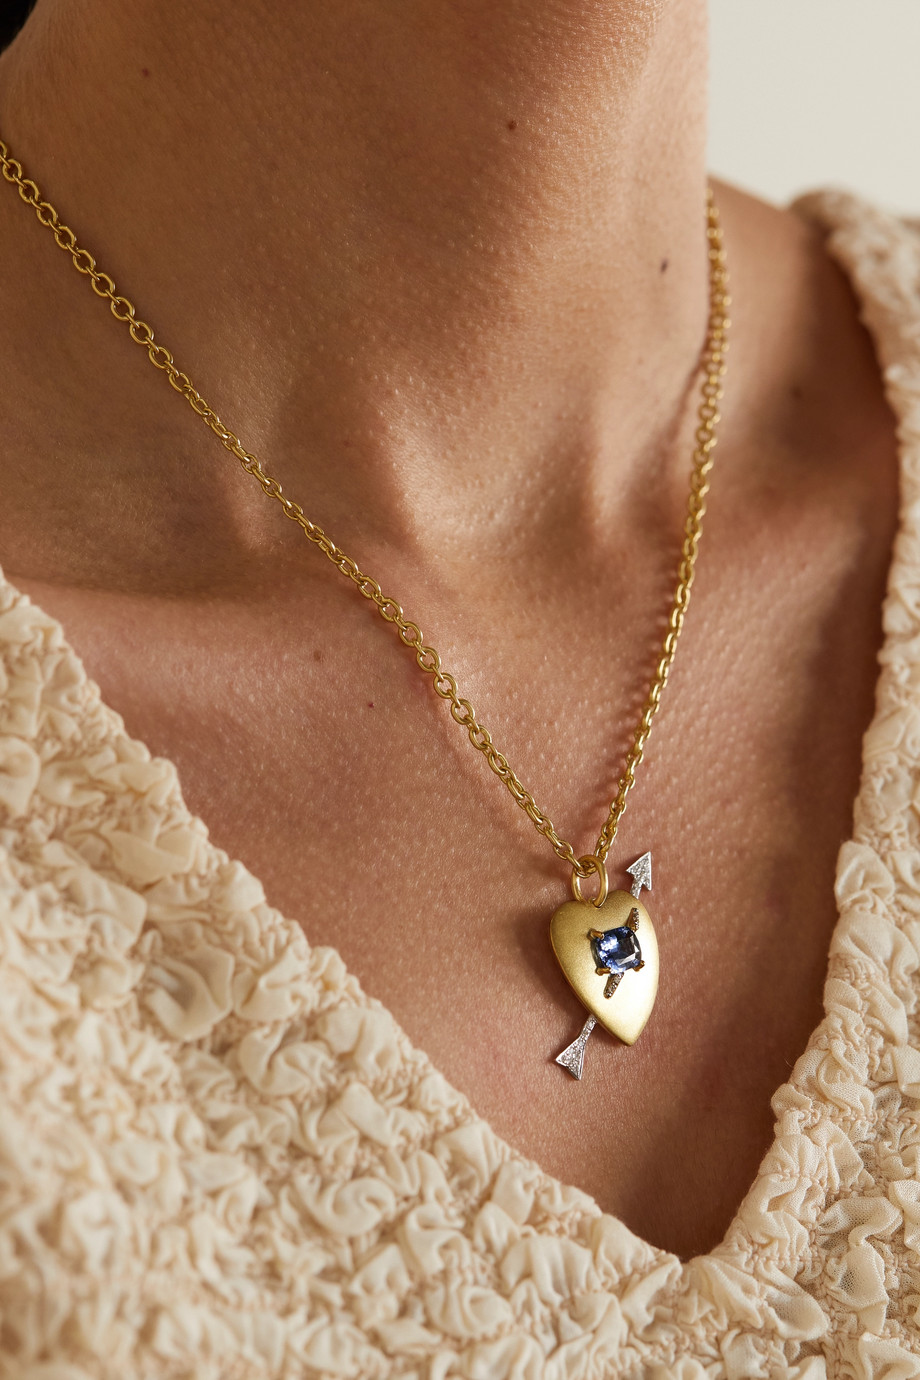 Irene Neuwirth True Love 18K 黄金、18K 白金、蓝宝石、钻石项链